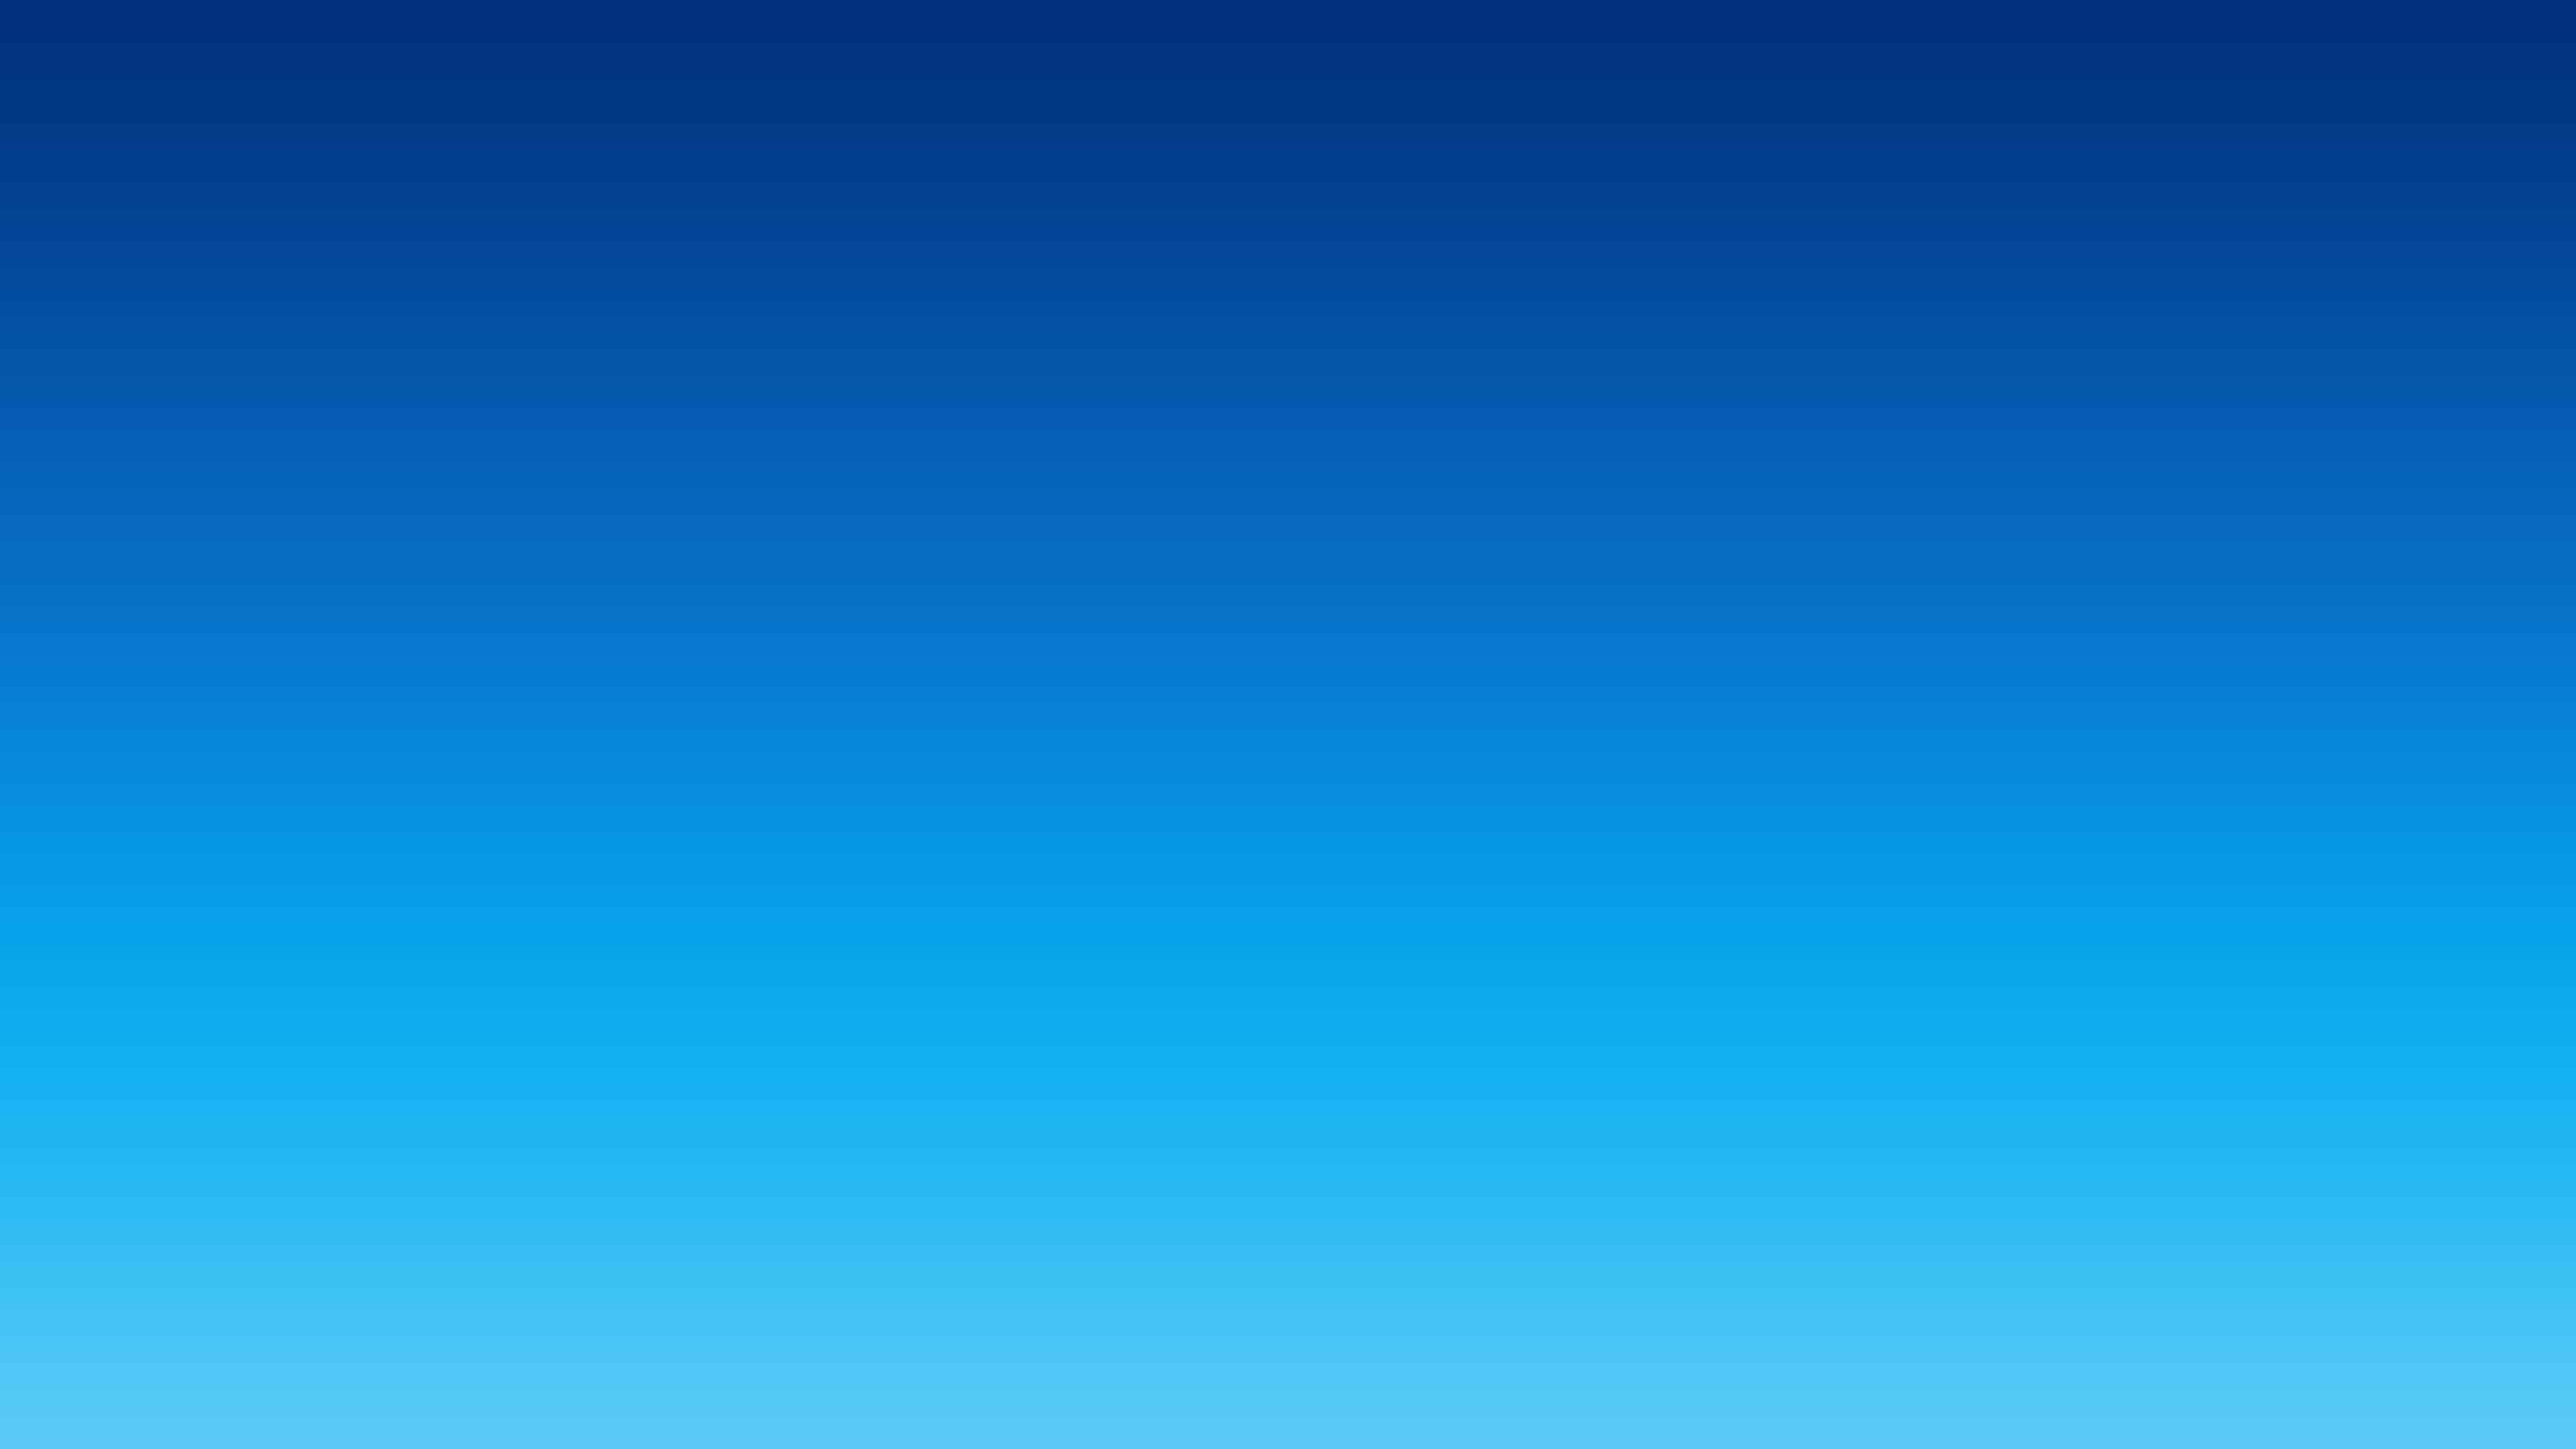 General 3840x2160 gradient minimalism simple blue background blue cyan